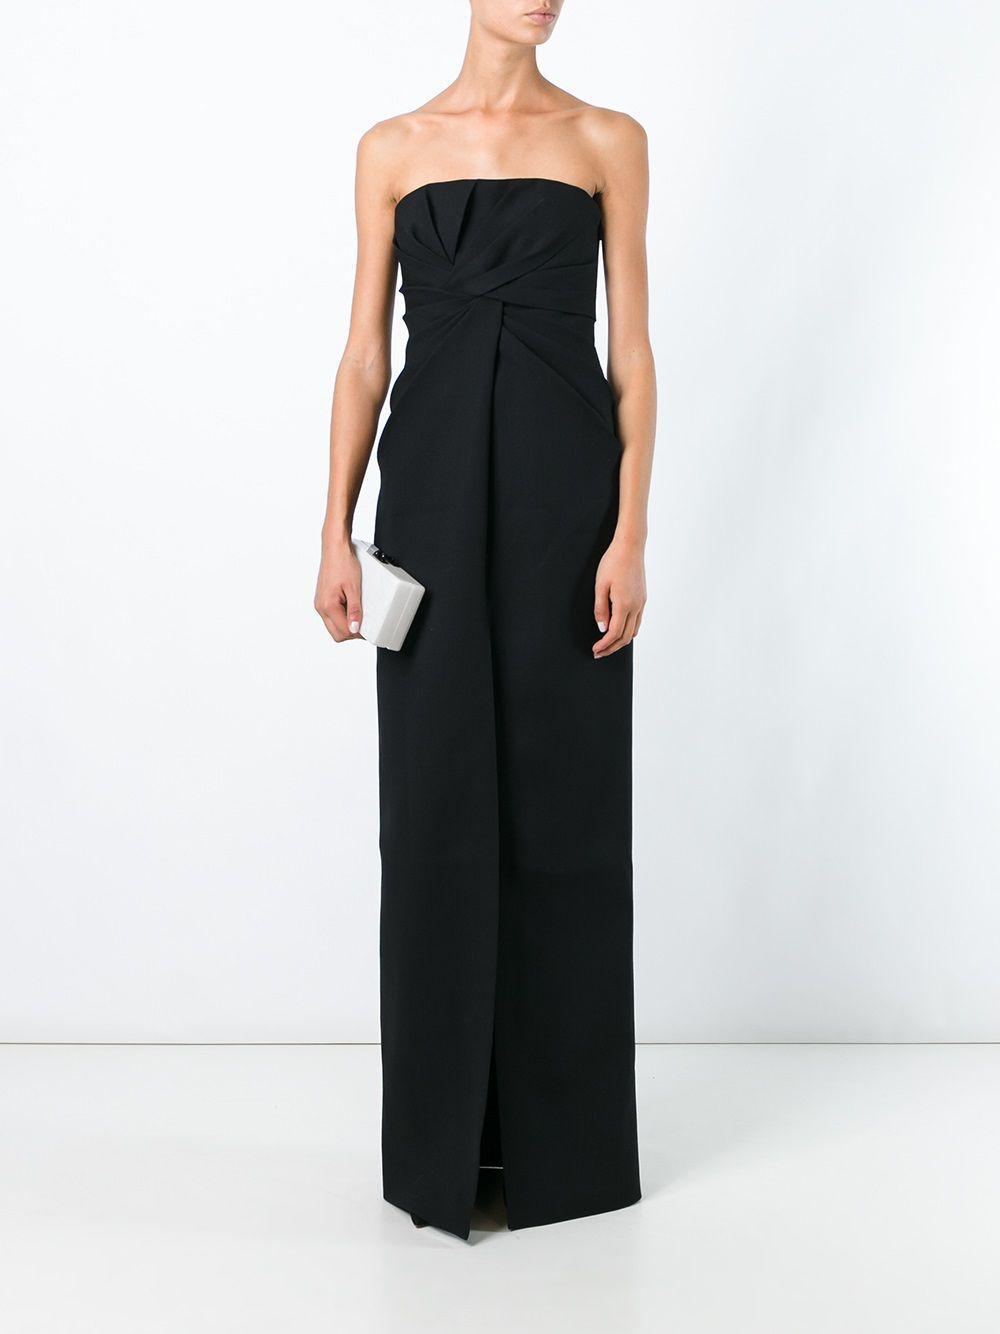 53fd0746977 Saint Laurent Strapless Bustier Long Dress in Black - Lyst